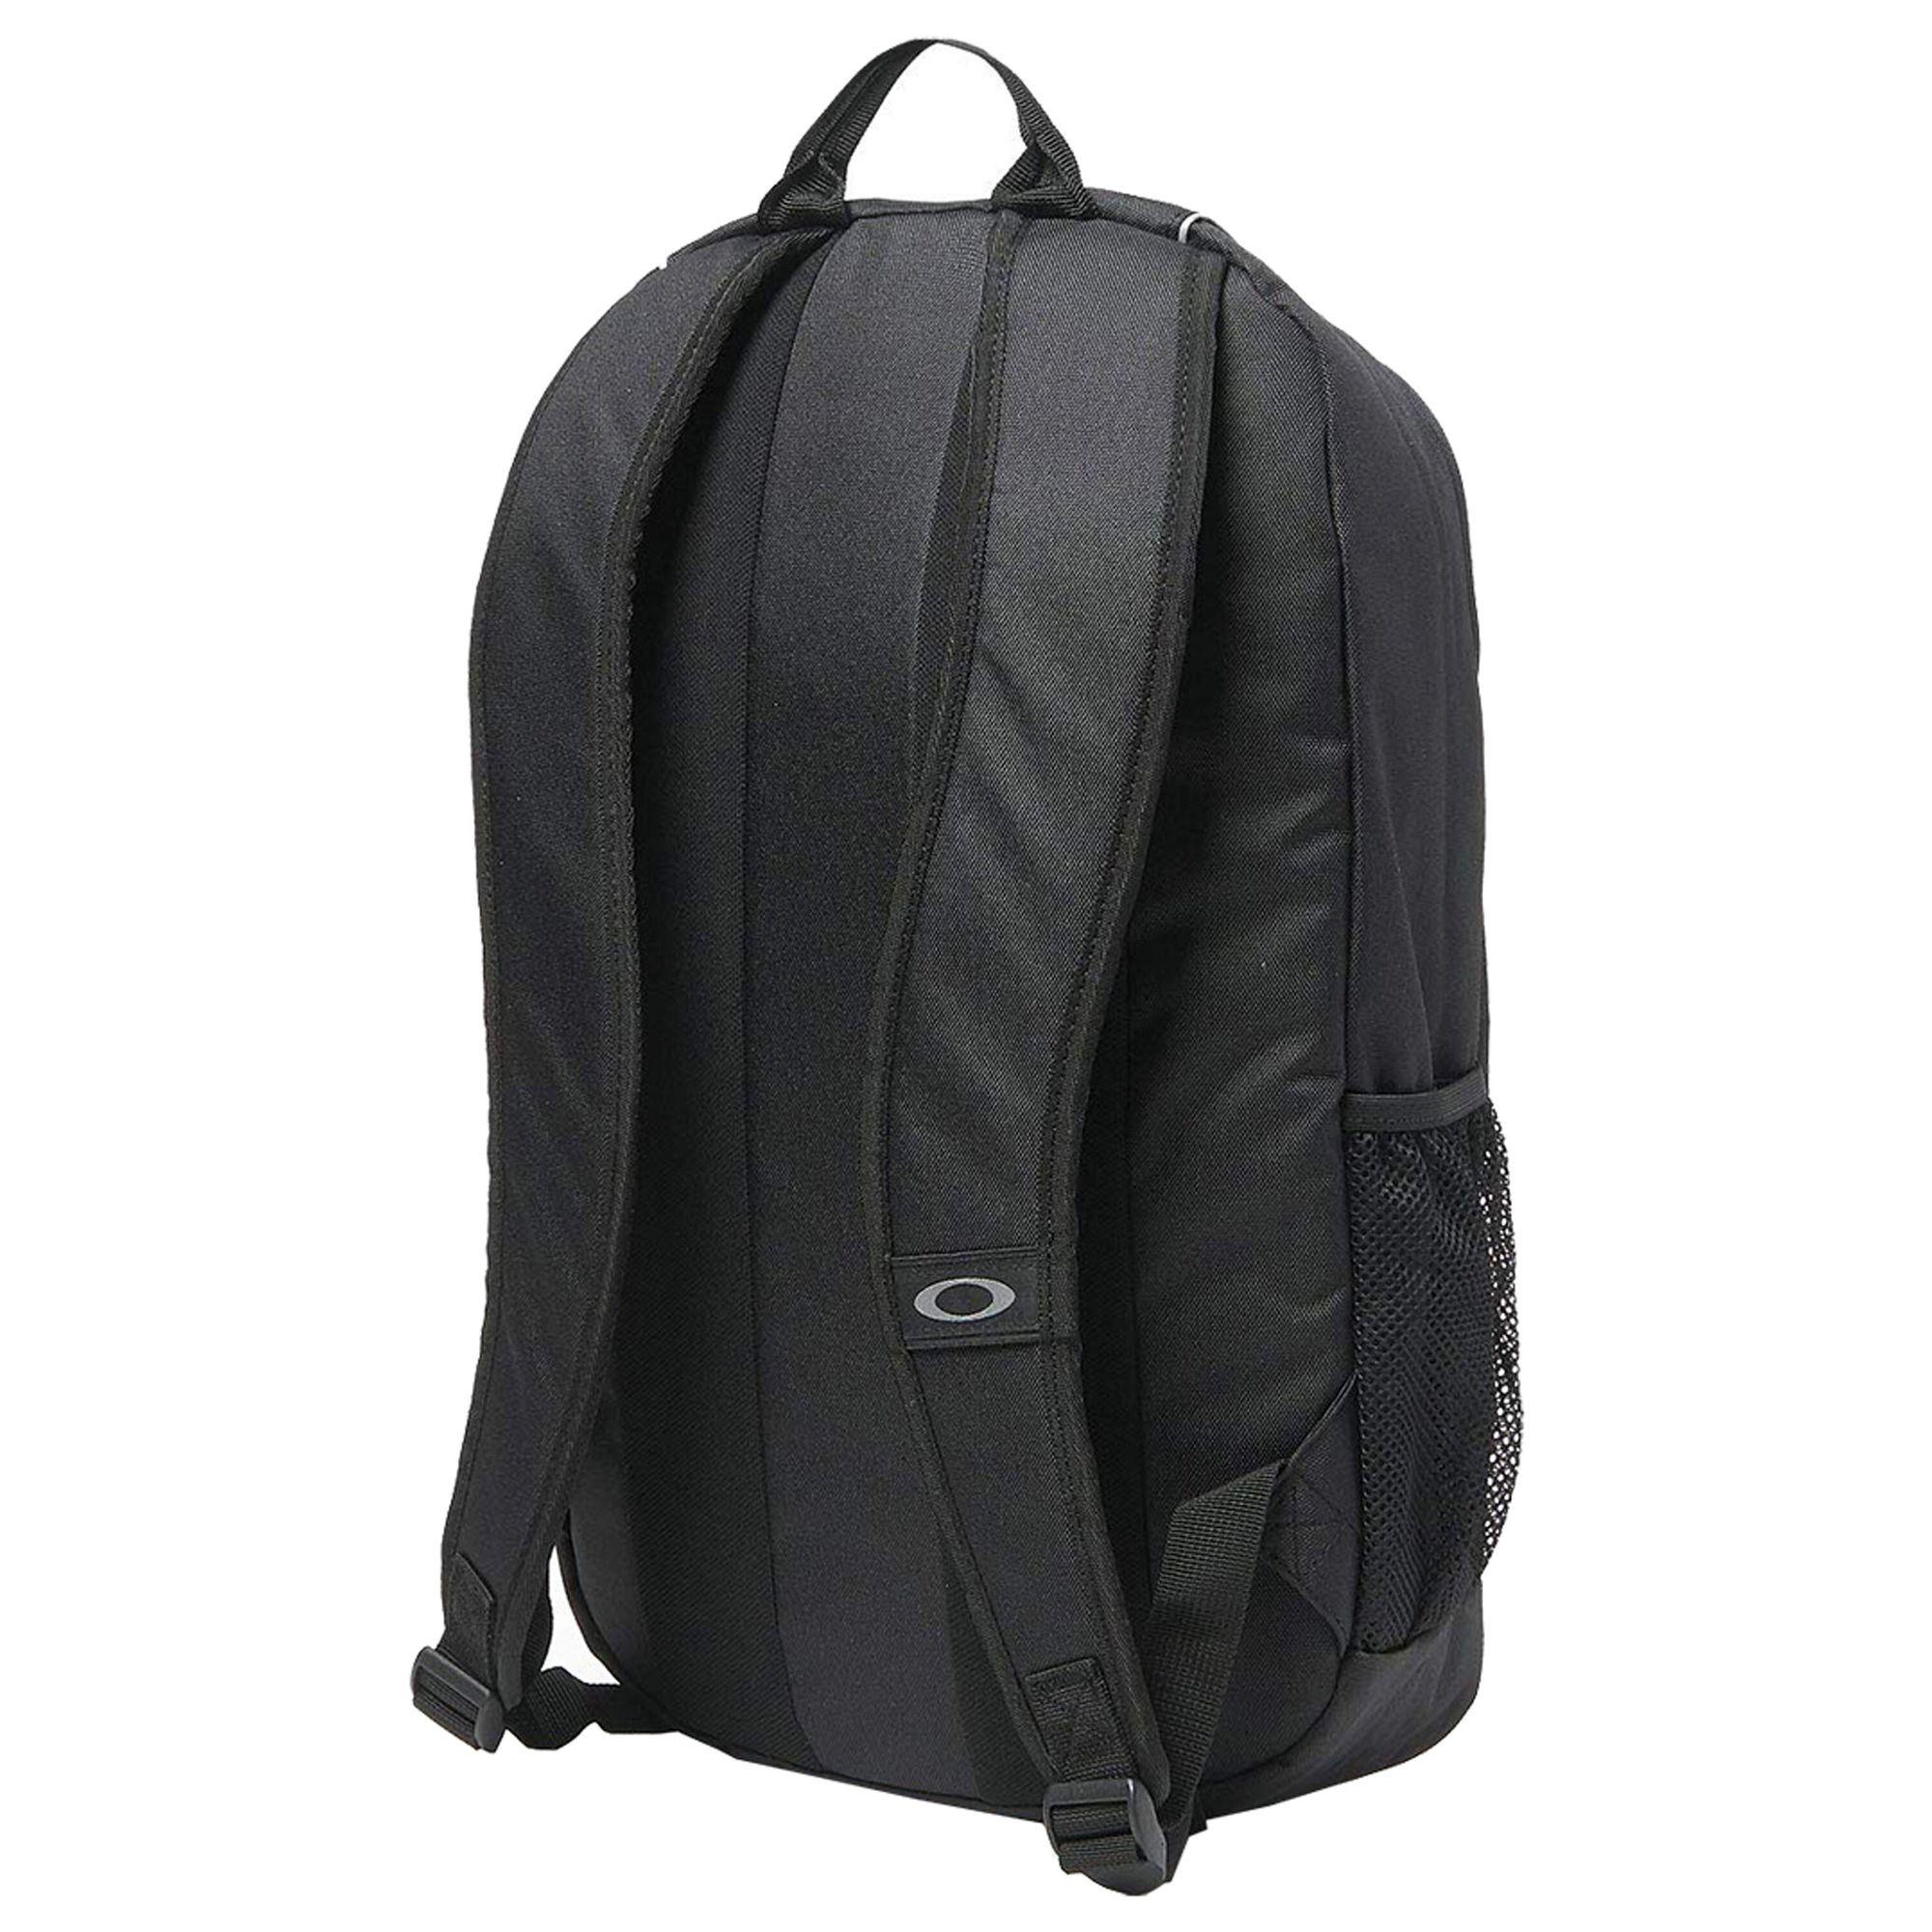 Oakley Enduro 20L 3.0 Rugzak Black